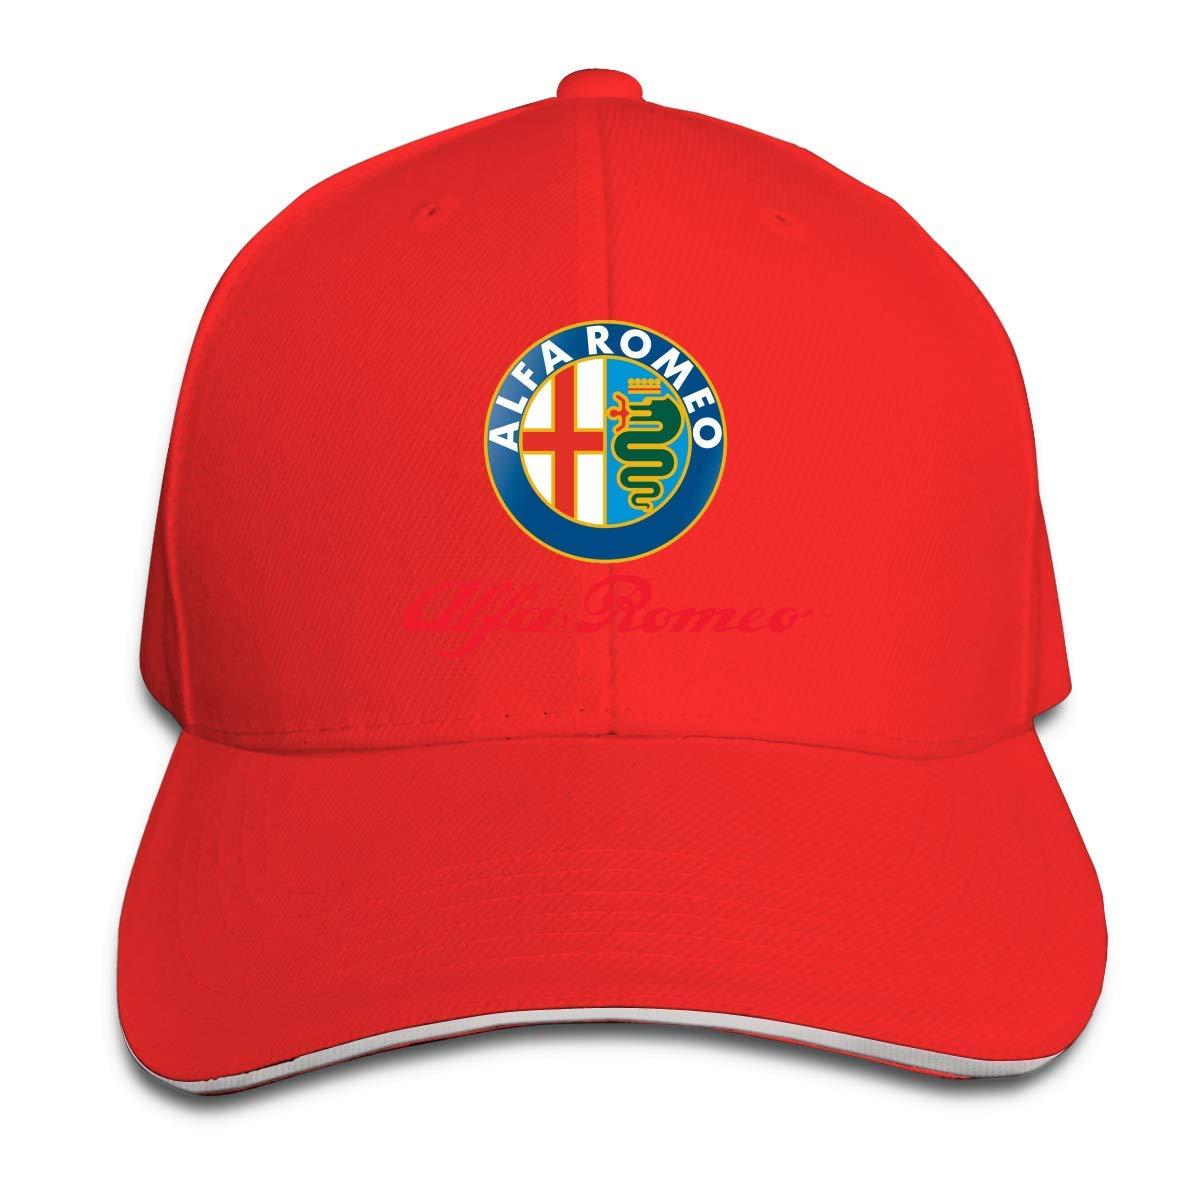 Novelcustom Gorra de béisbol sándwich Ajustable Unisex Sombrero de ...